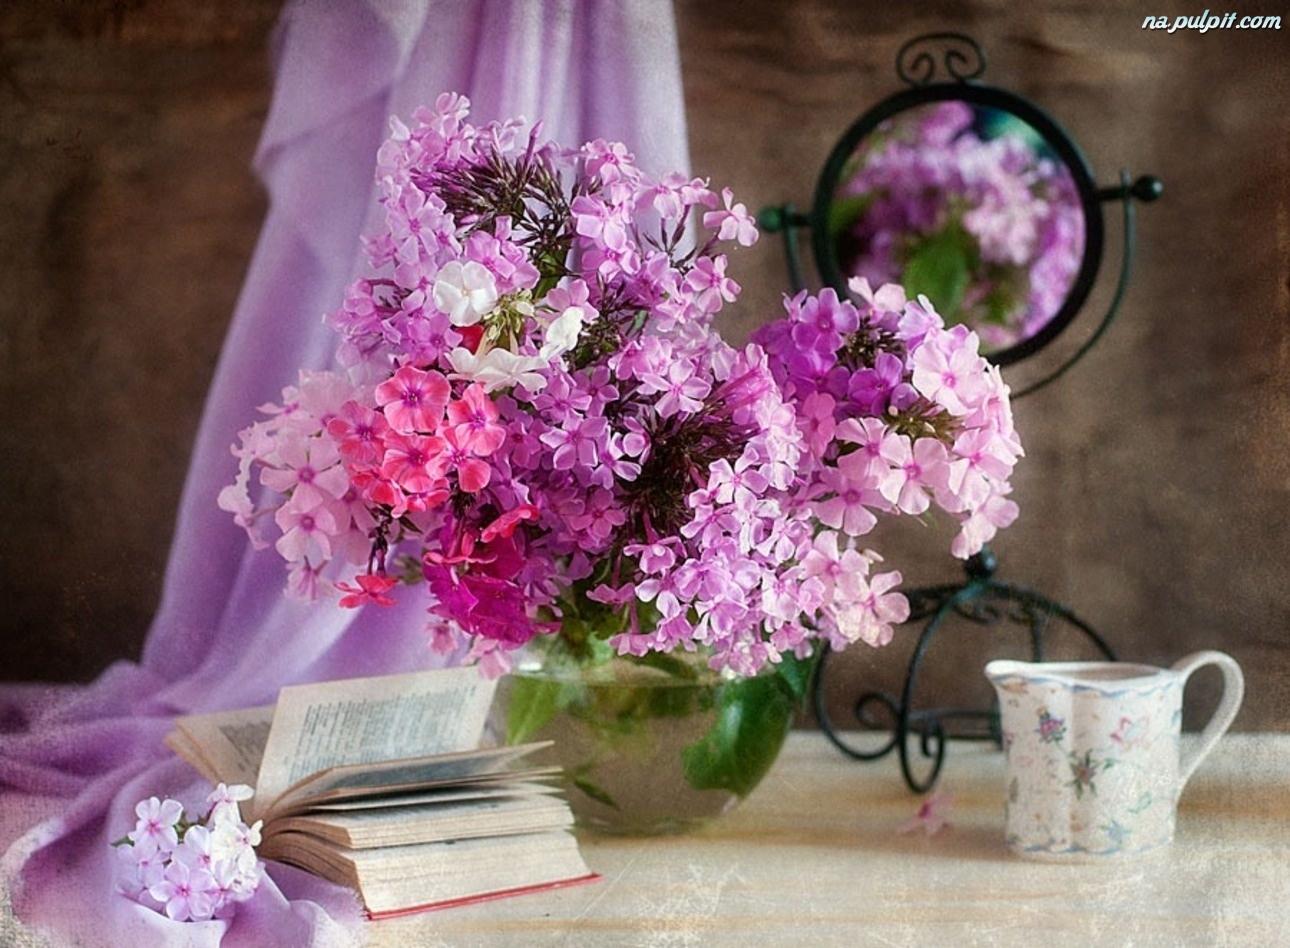 Kwiaty Wiosenne Telefon Genuardis Portal Picture